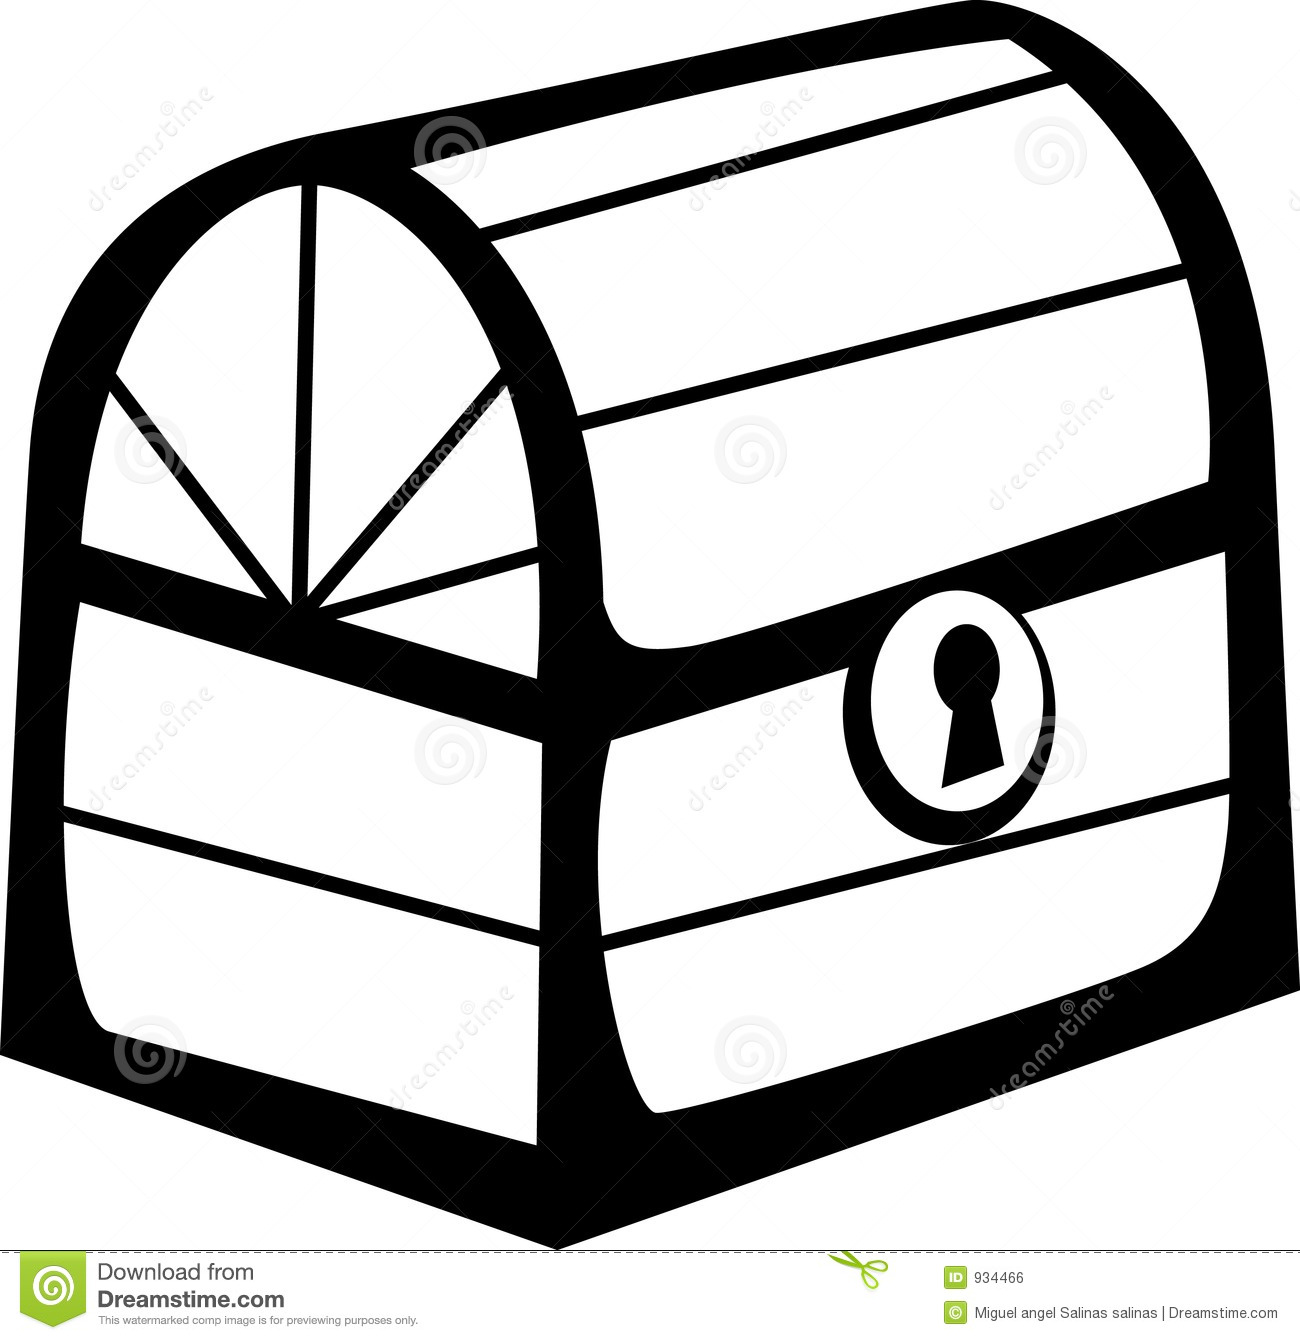 Pirate clipart black and white treasure map clip art freeuse stock Treasure Map Clipart Black And White | Clipart Panda - Free ... clip art freeuse stock